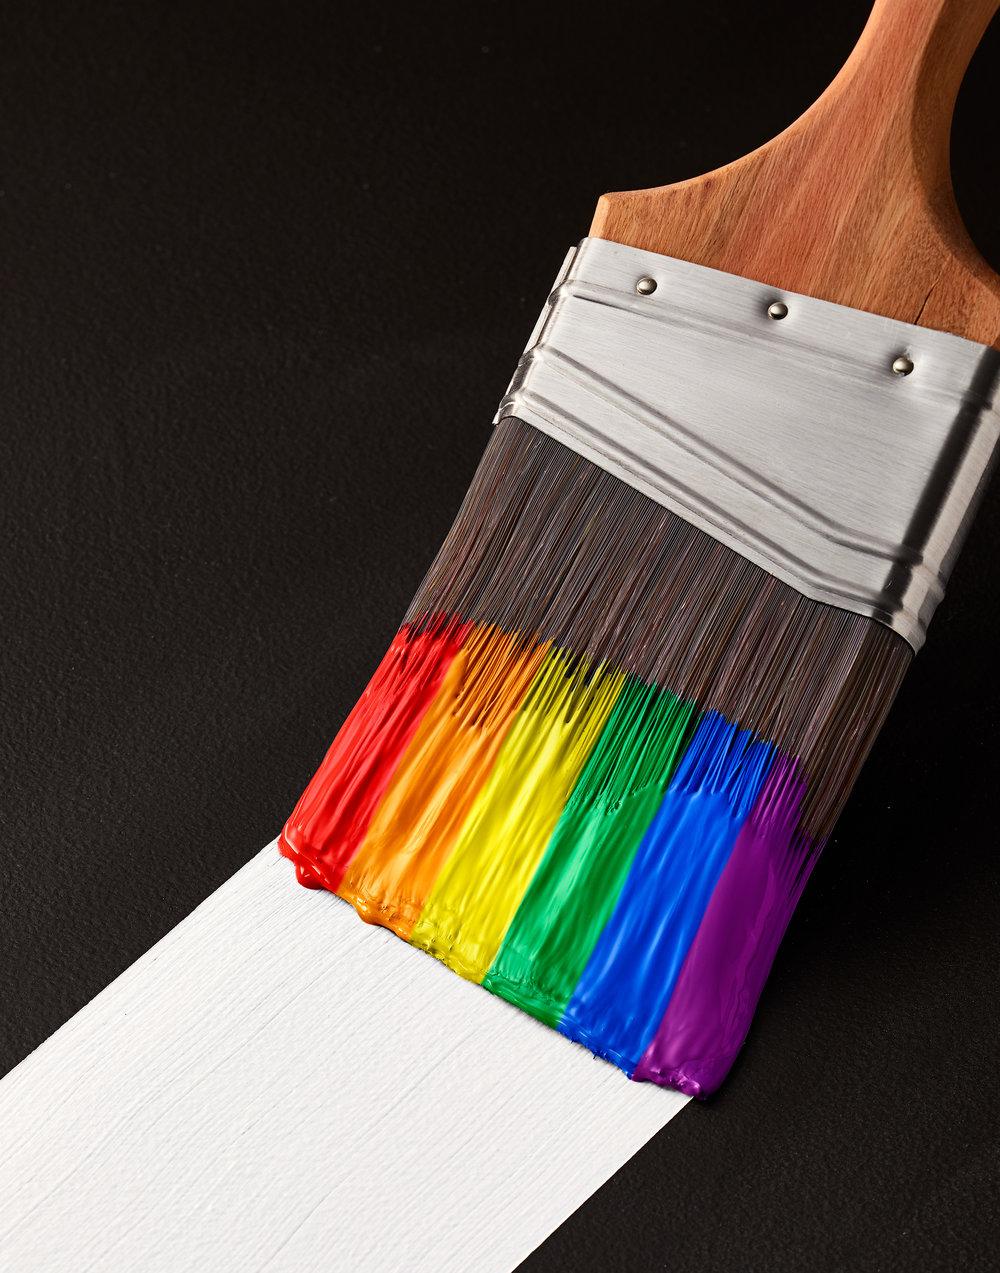 051818Color-paintbrush23509_v2-copy.jpg